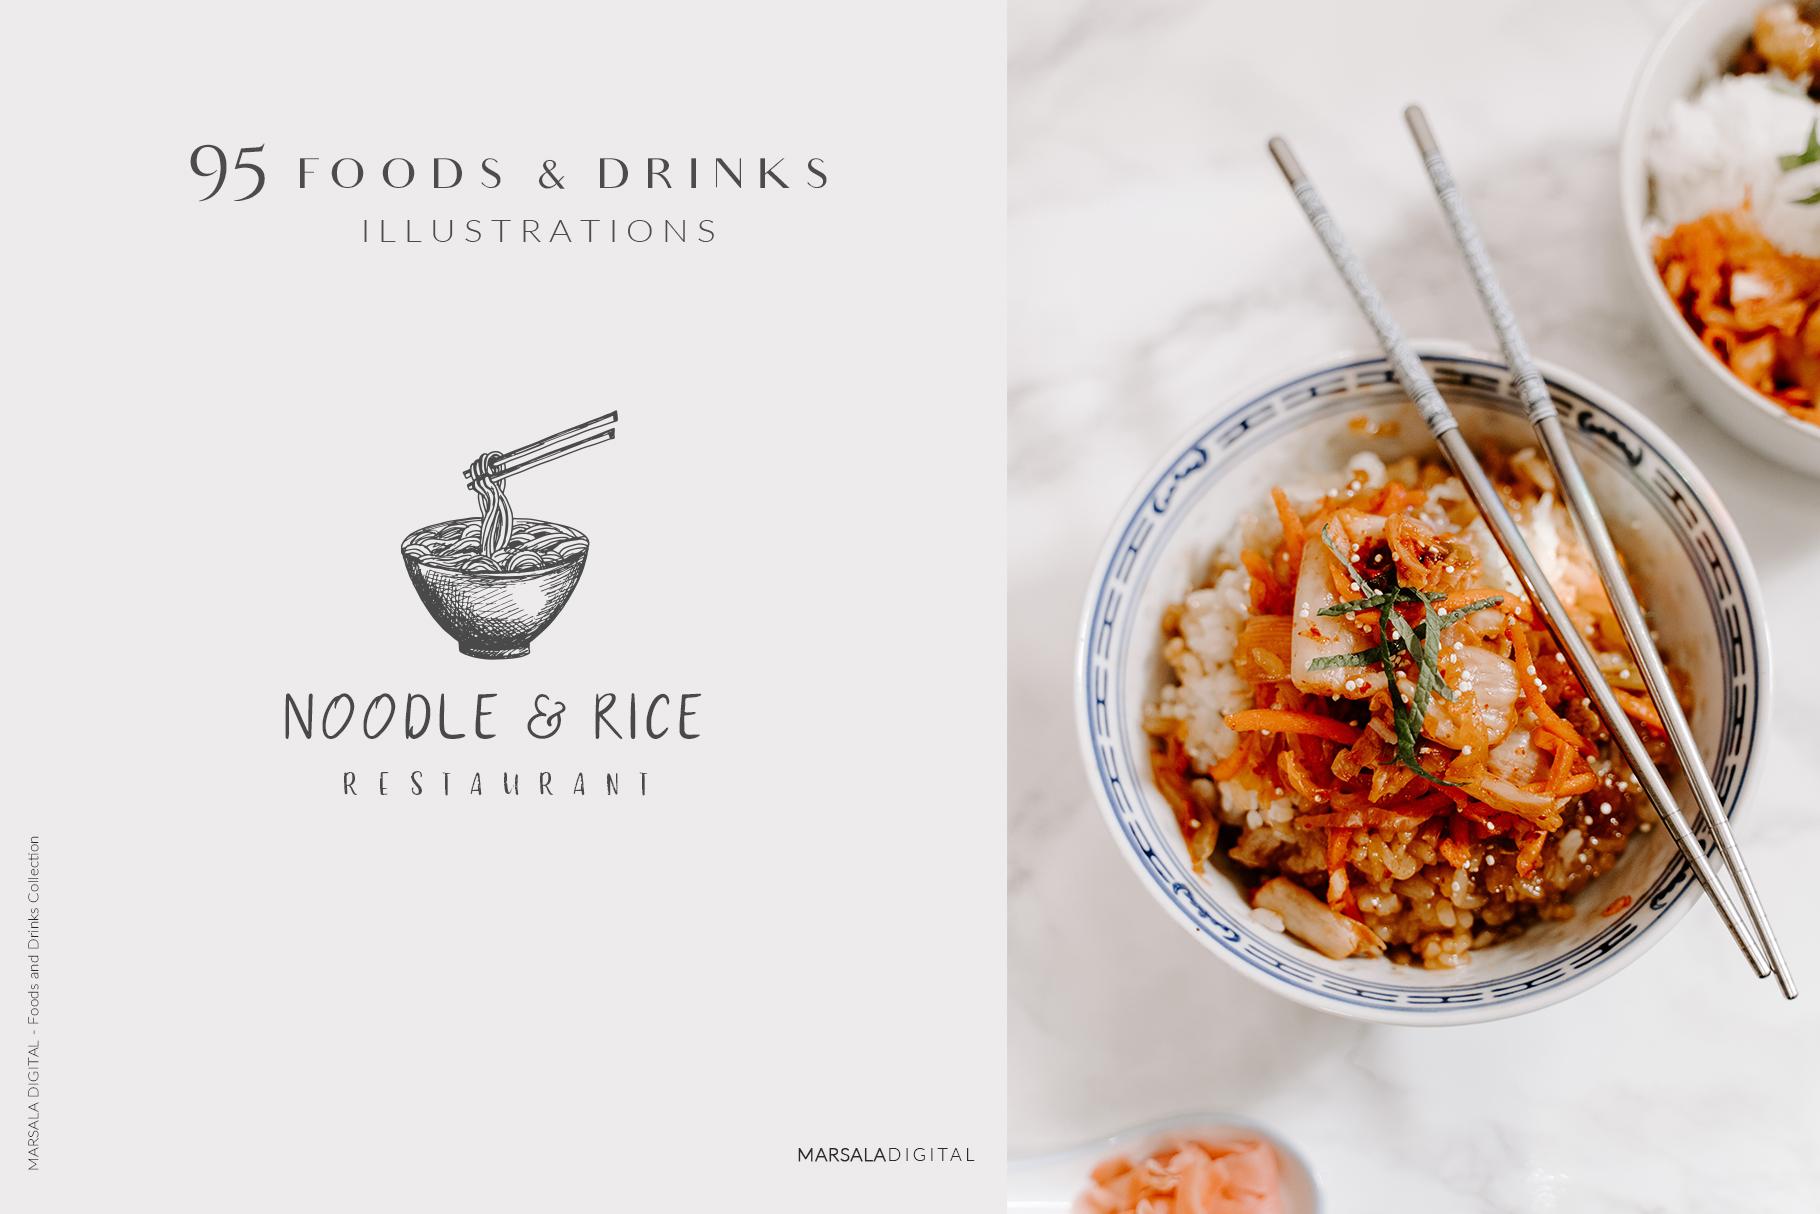 Foods & Drinks Logo Elements Handrawn Graphics example image 7